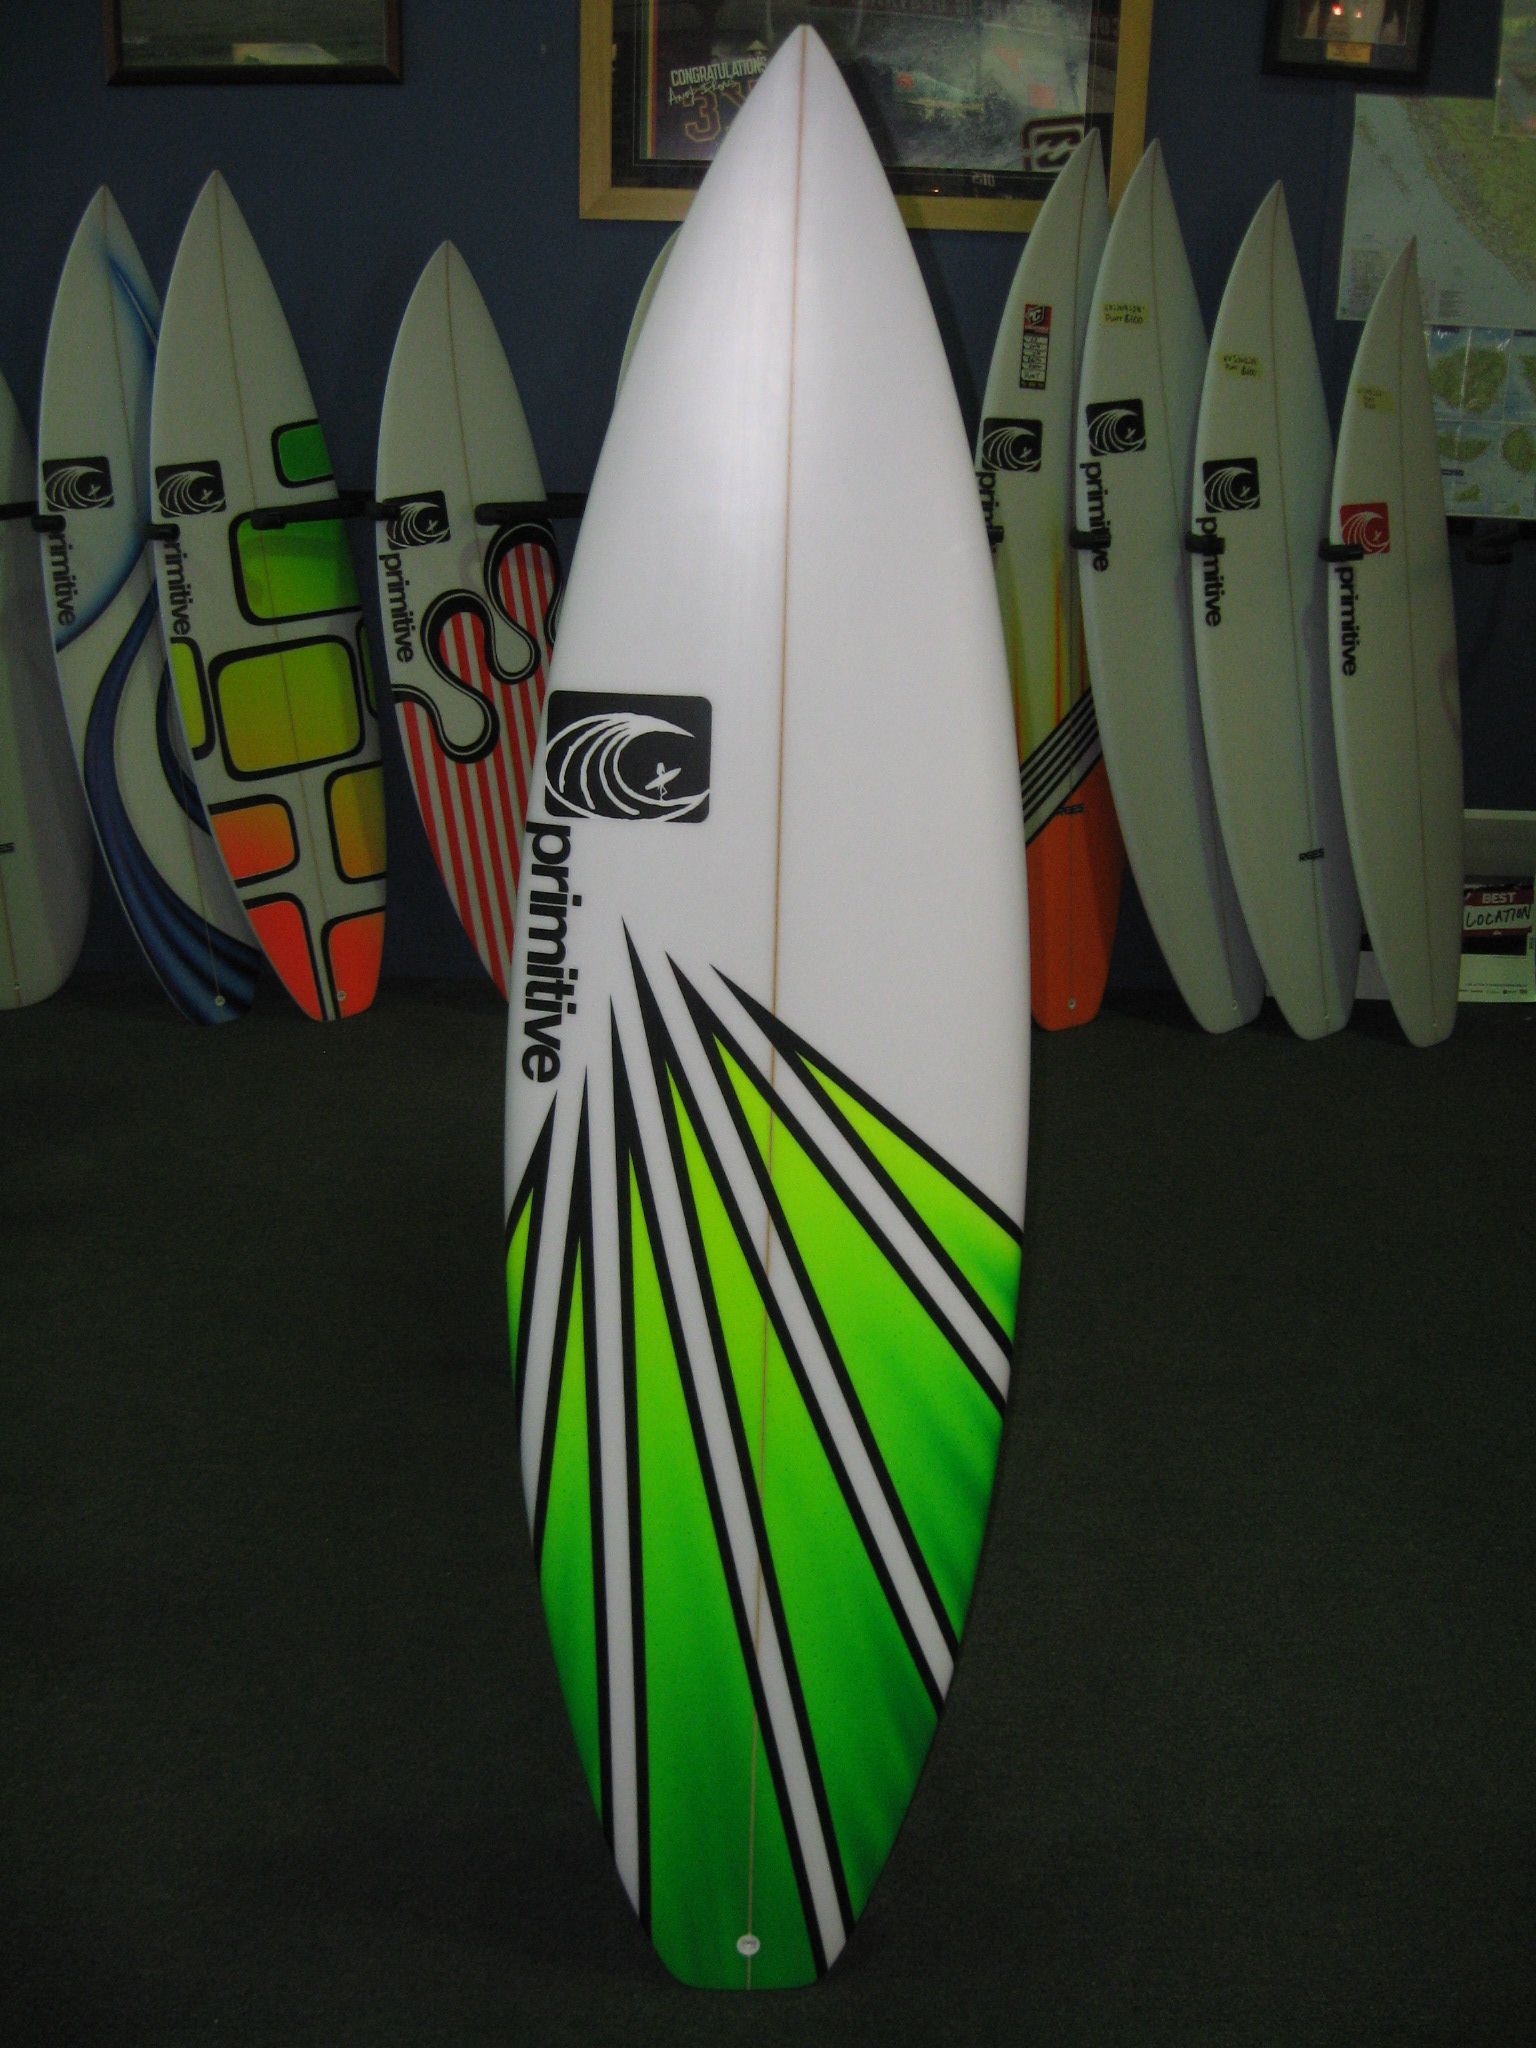 Showcasing Some Surf Board Designs And Surf Board Decor, Fashion